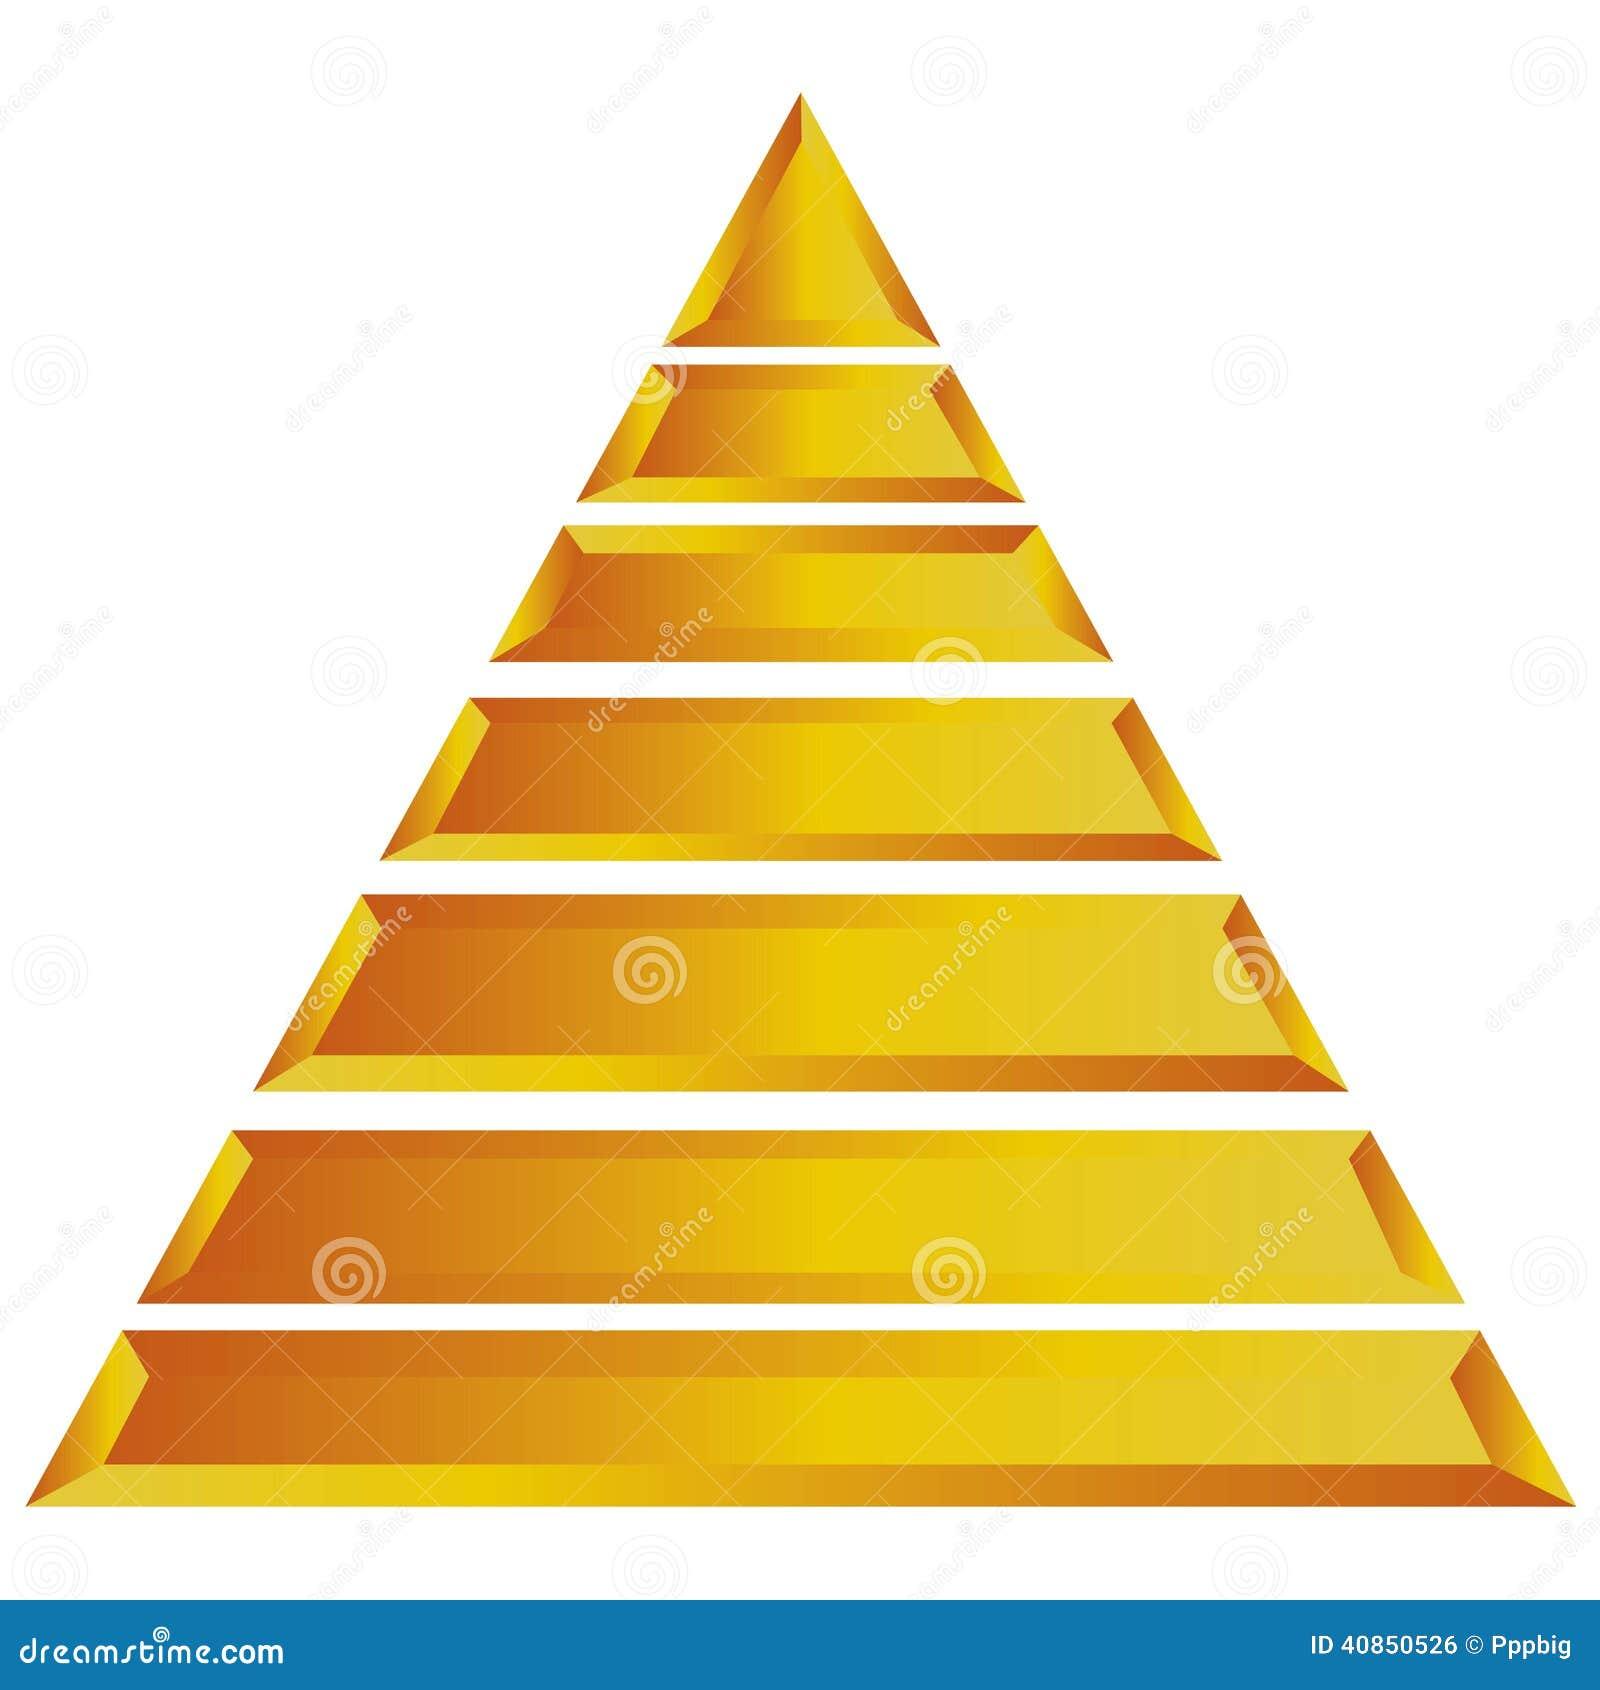 Pyramid diagram stock illustration illustration of progress 40850526 gold pyramid diagram for presentation template ccuart Images